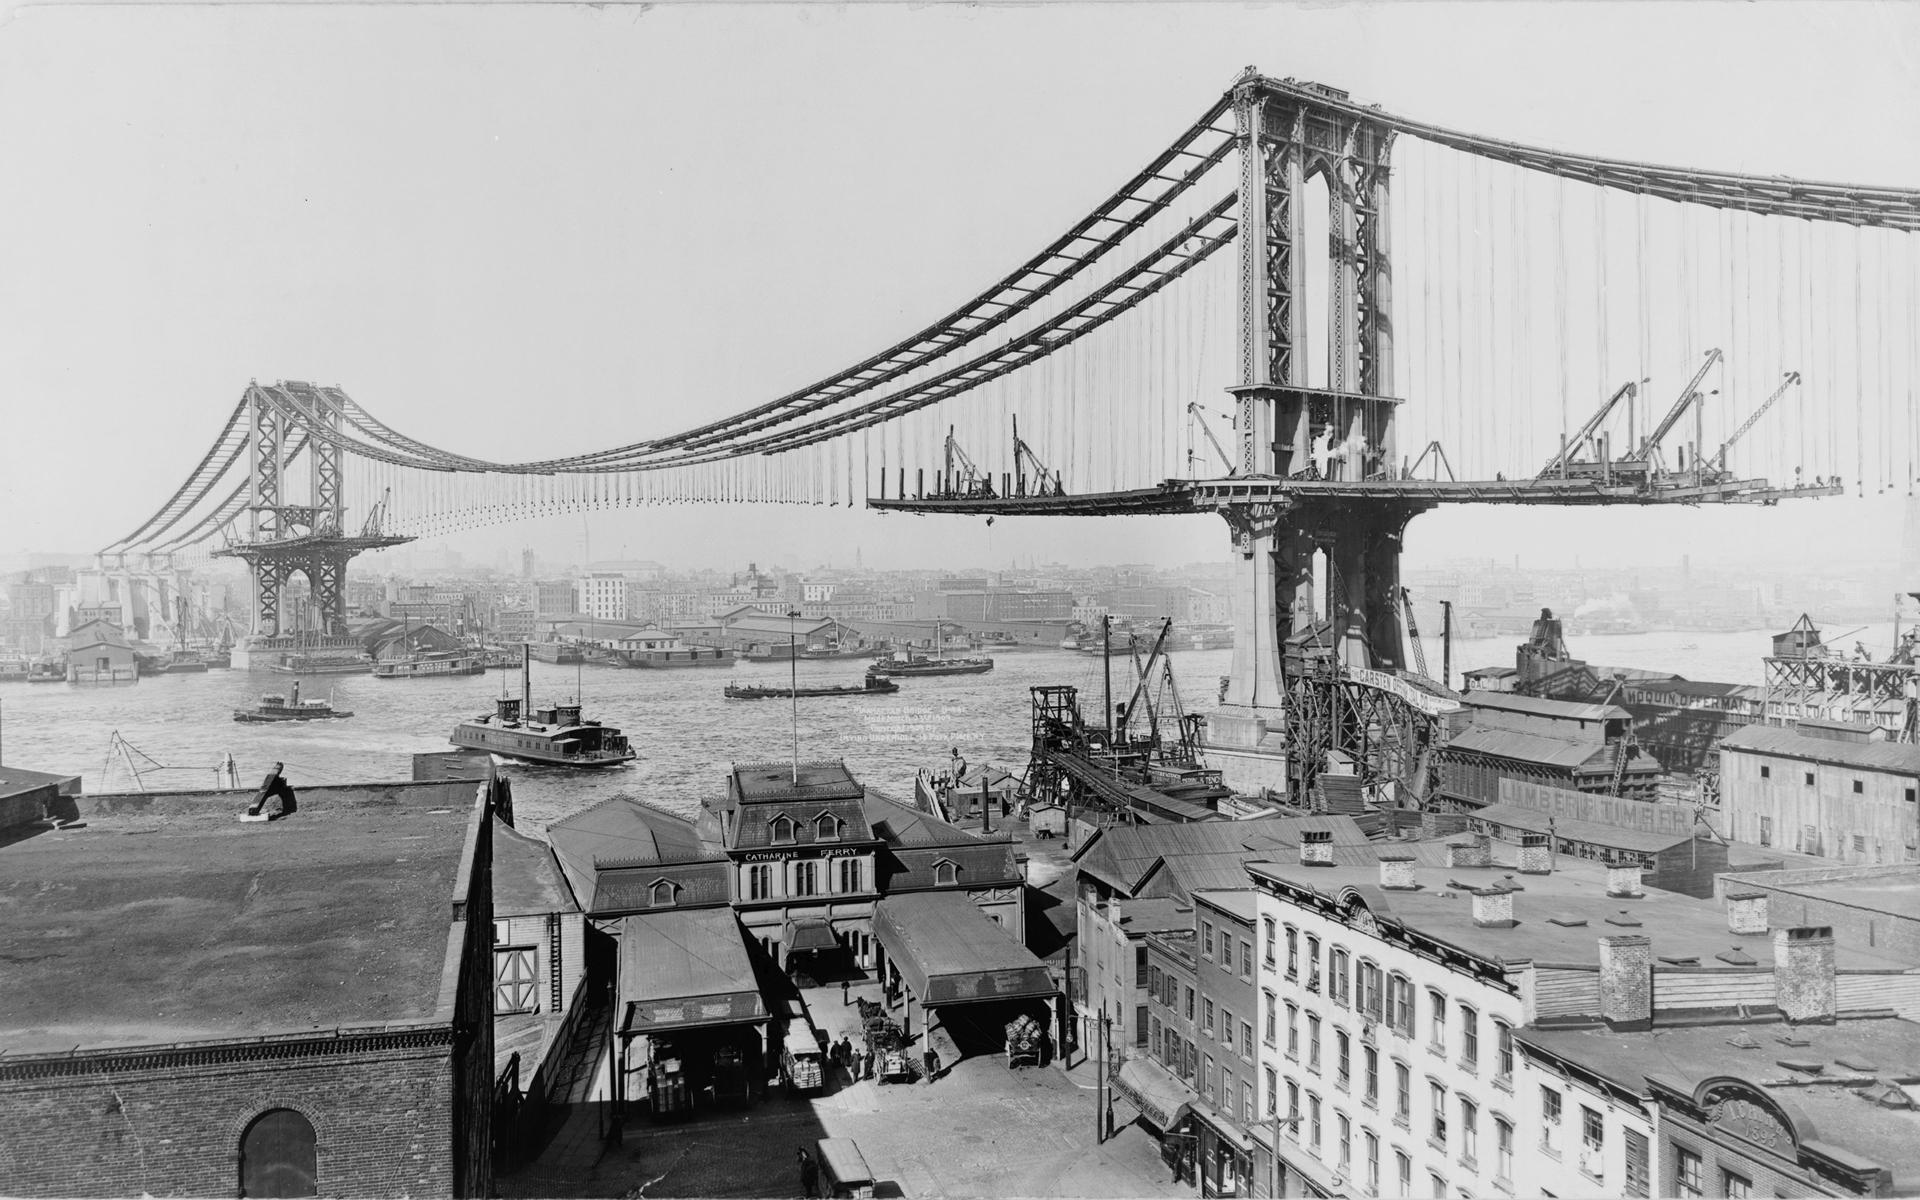 Black White Photo Of The Manhattan Bridge Under Construction Photographer Unknown